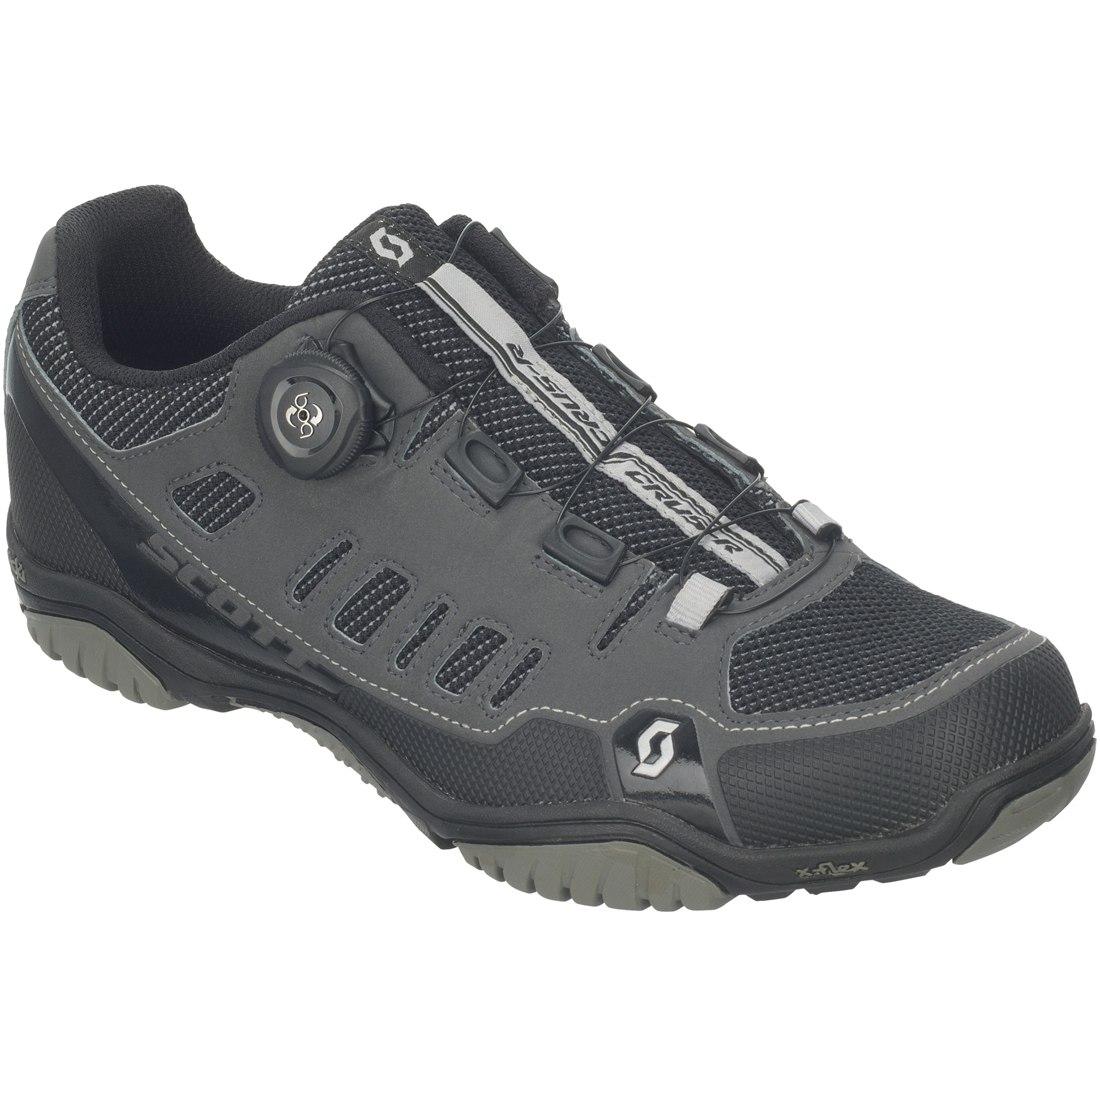 SCOTT Sport Crus-r BOA Schuh - anthracite/black